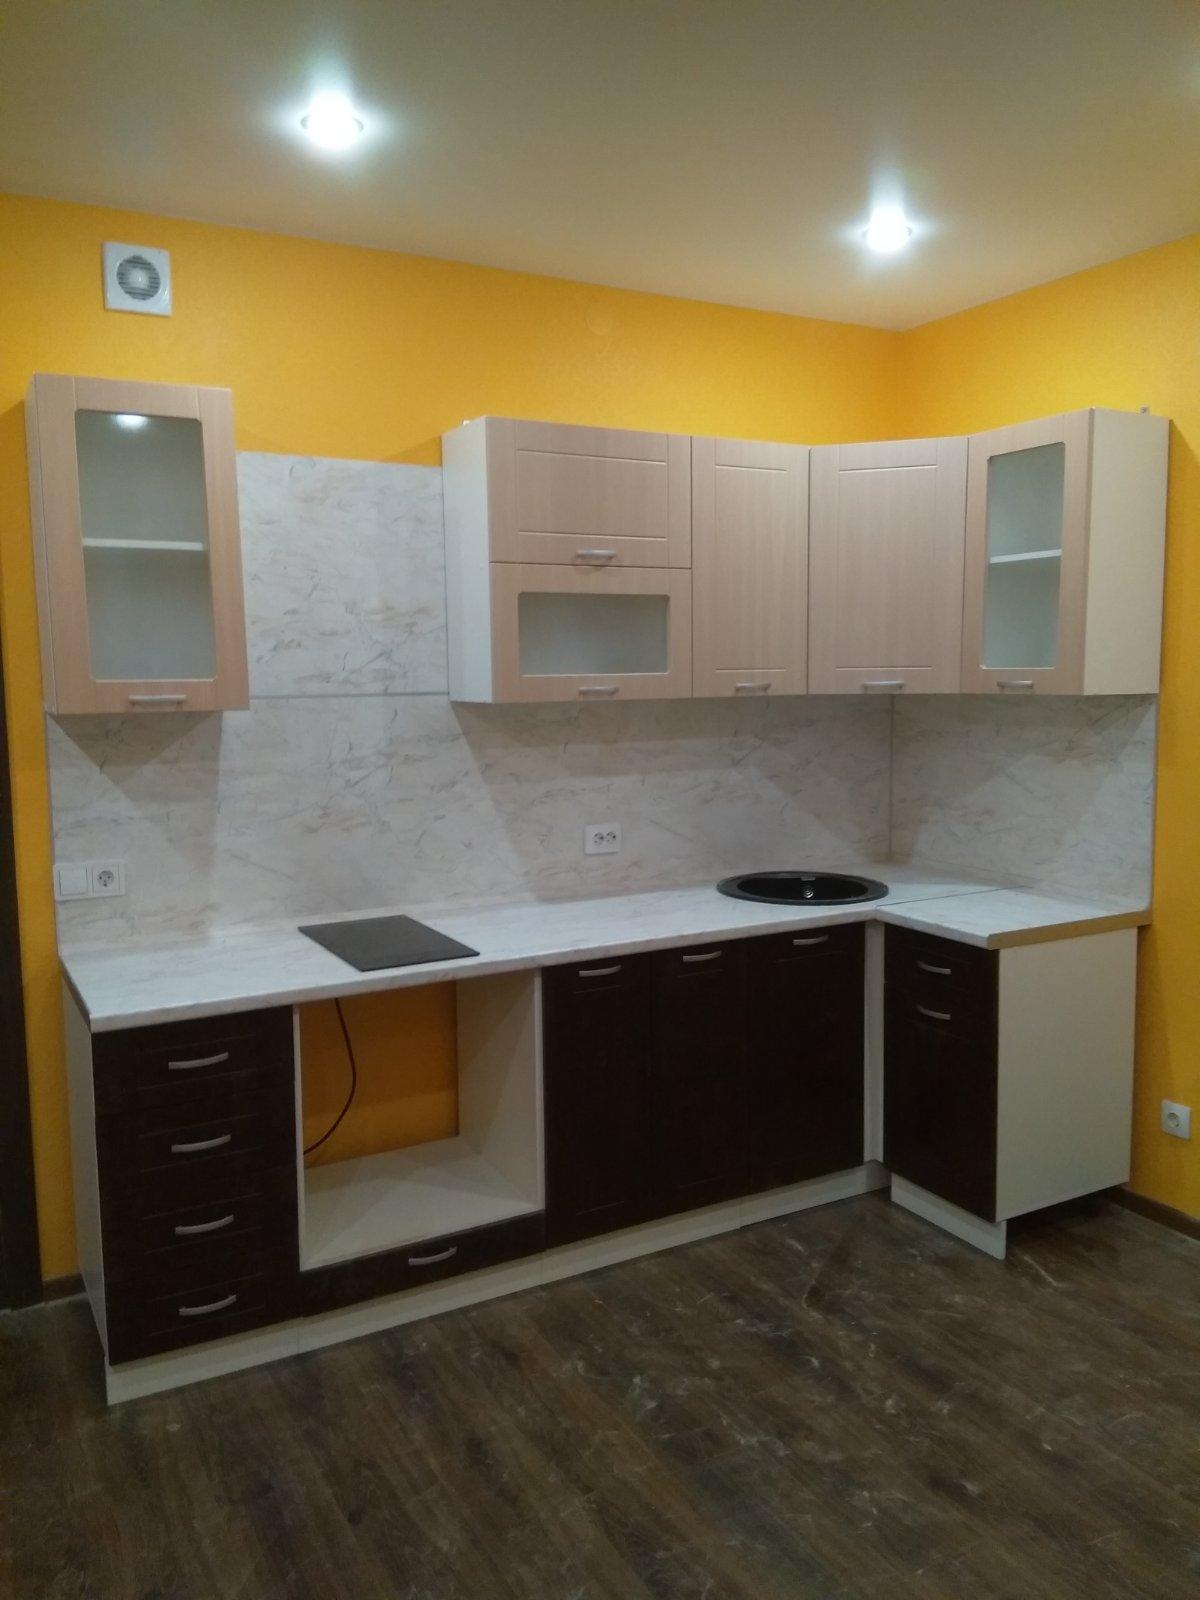 Модульная кухня недорого